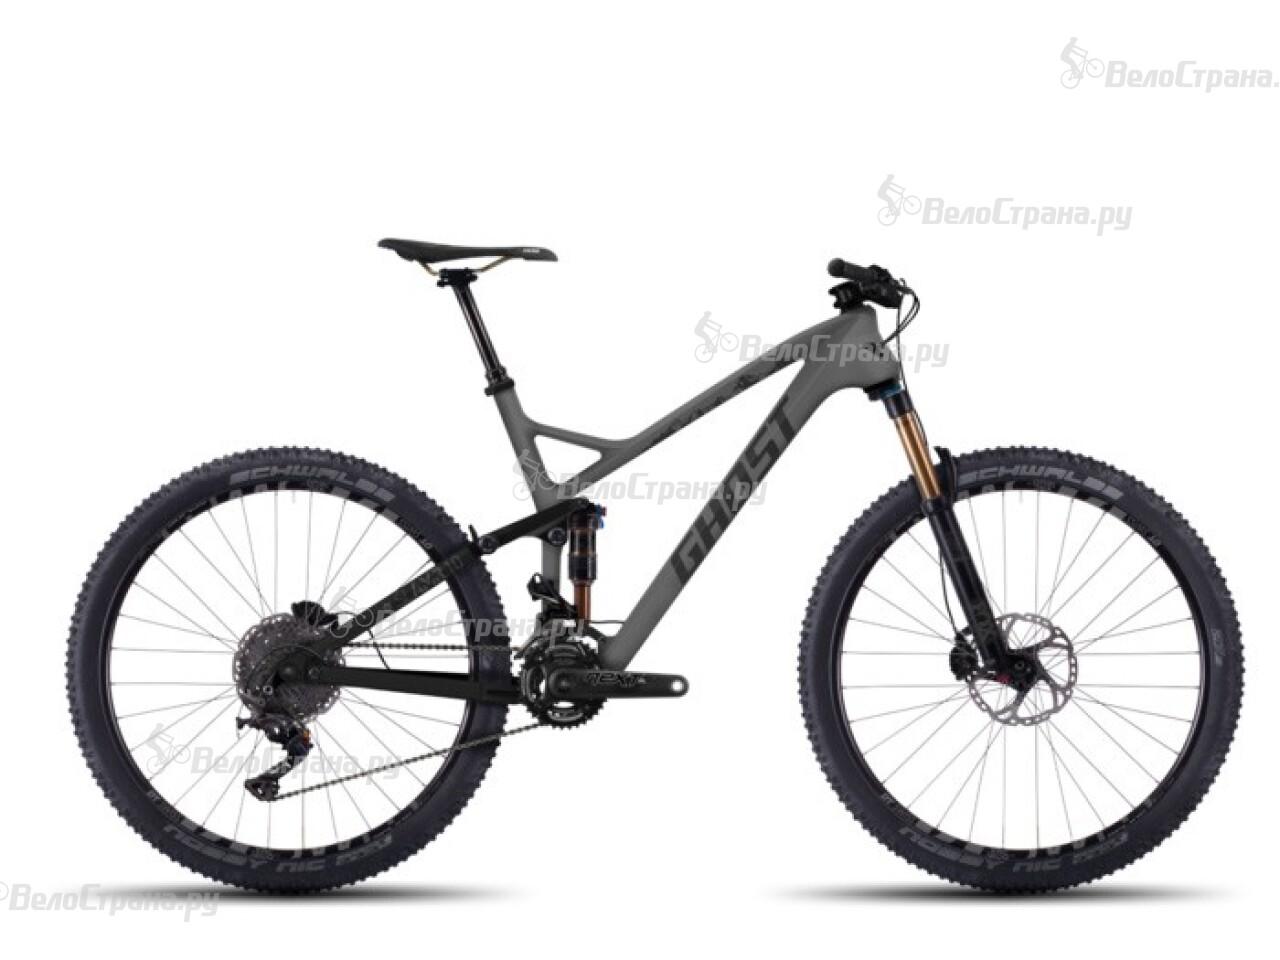 Велосипед Ghost SL AMR LC 10 (2016) велосипед ghost amr 4 2016